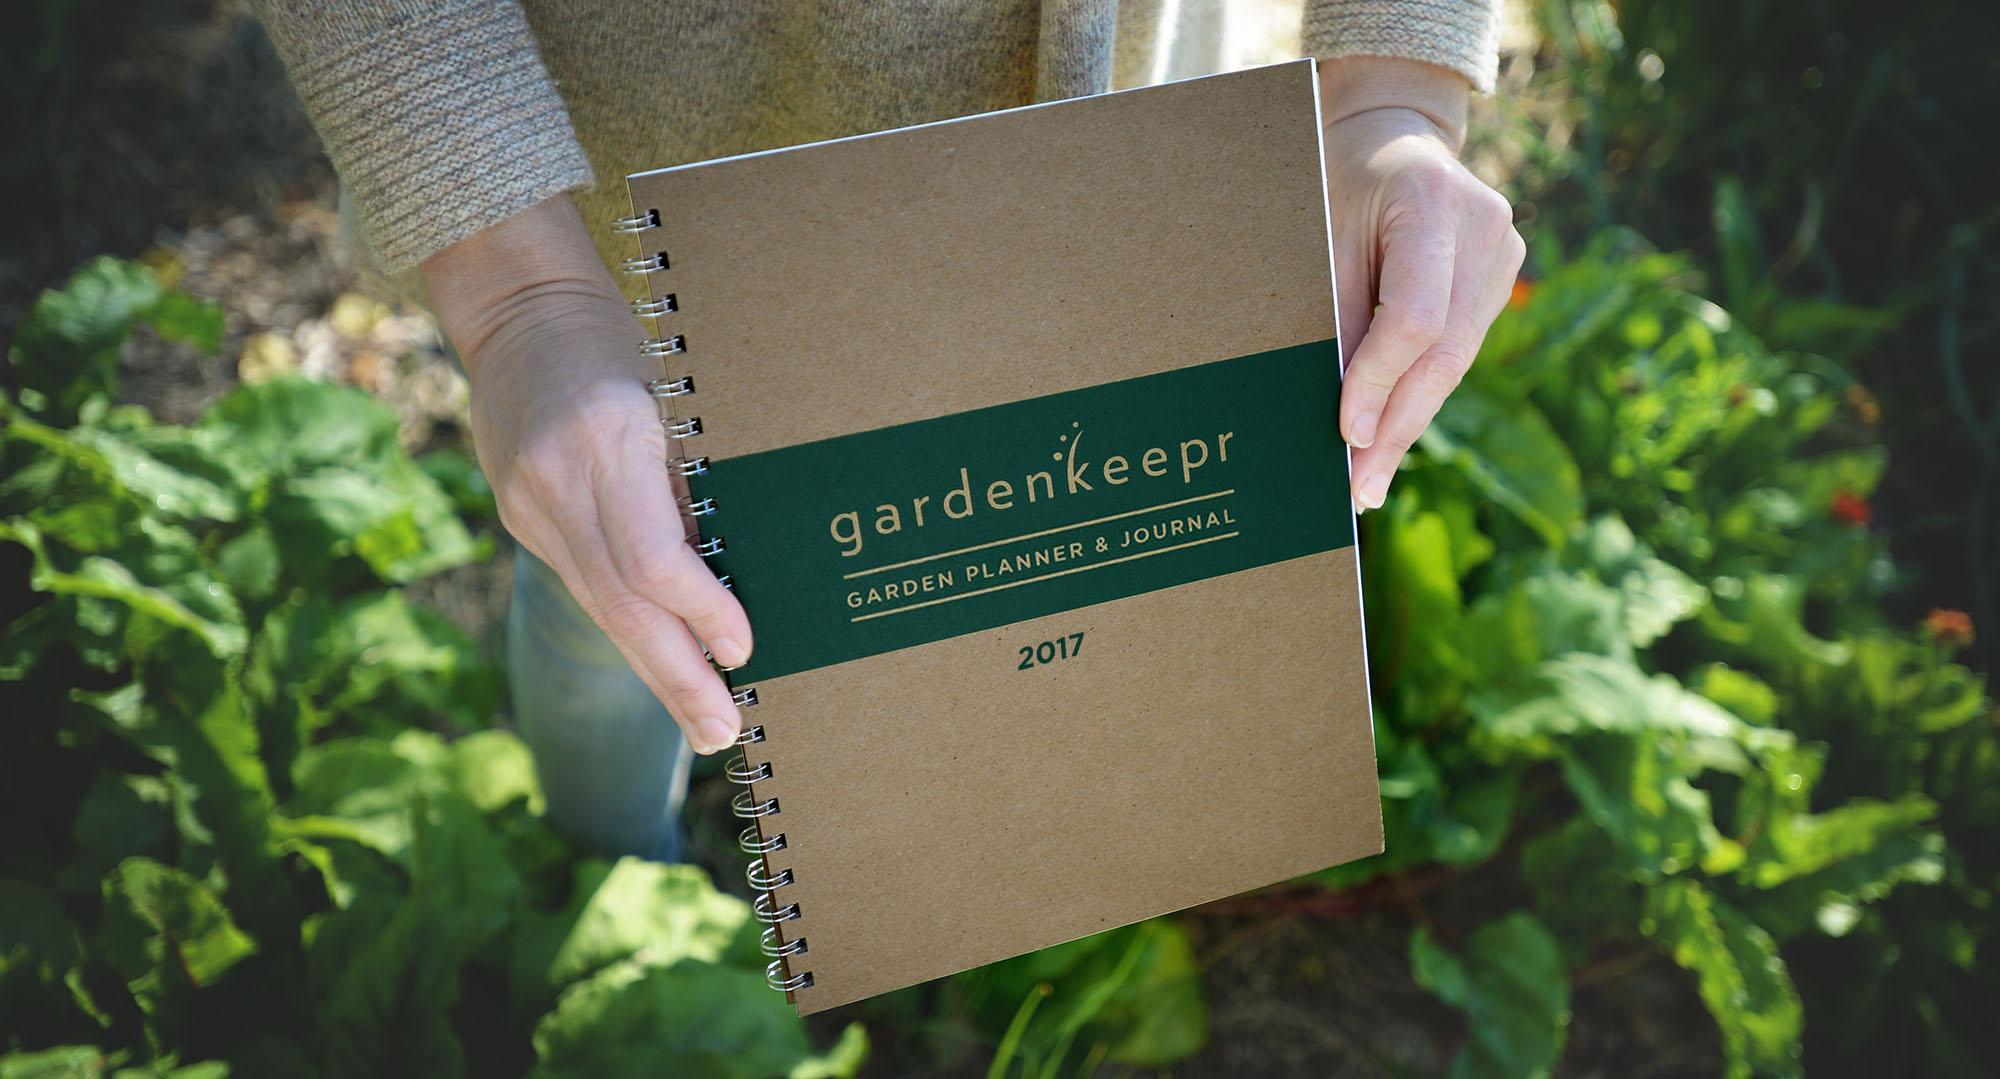 gardenkeepr2017_hcrop_125ppi.jpg